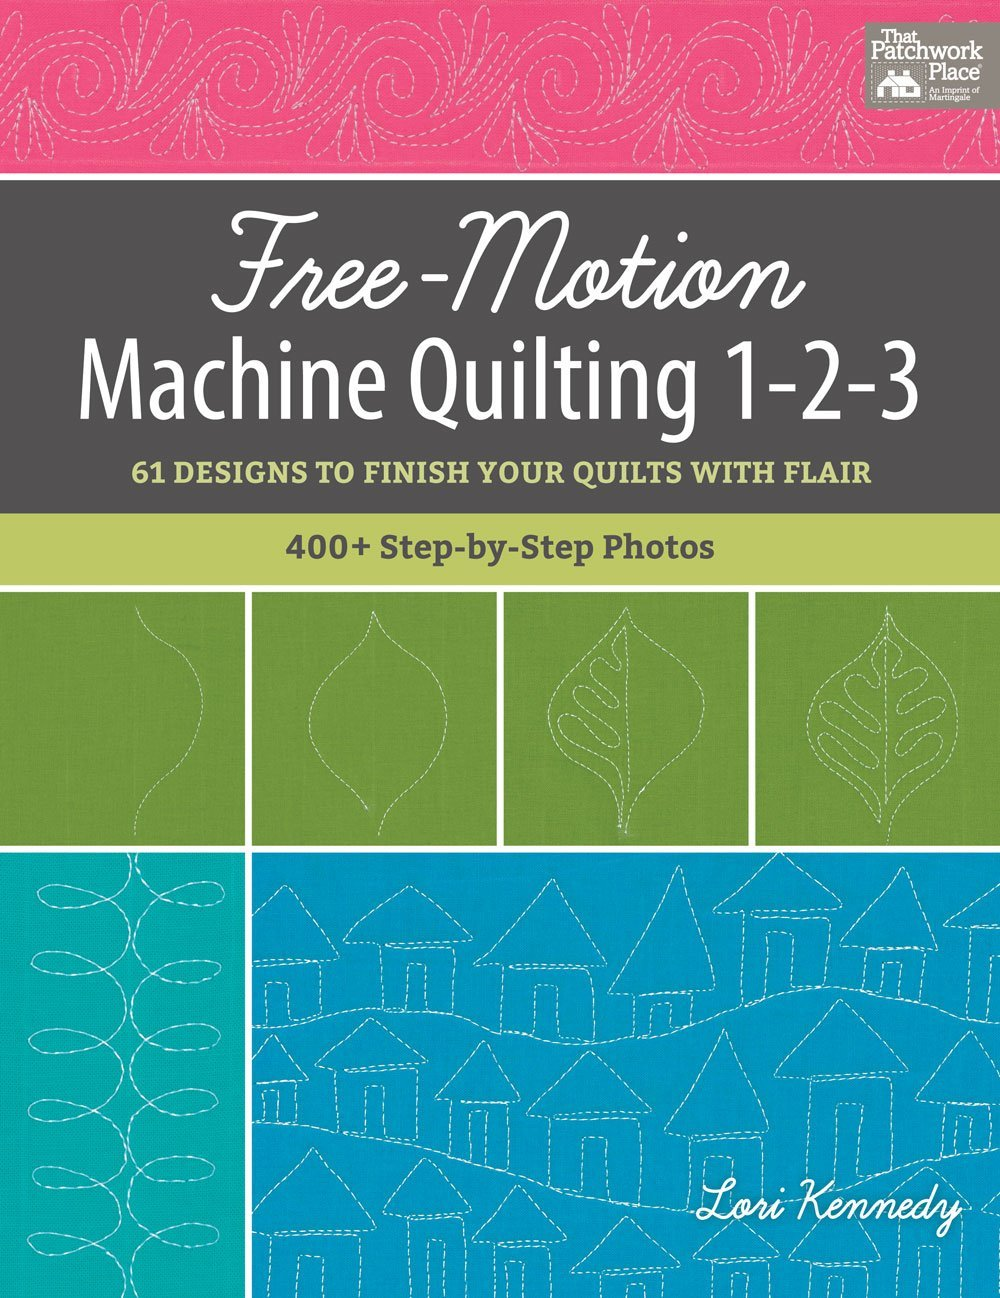 Free Motion Machine Quilting 1-2-3